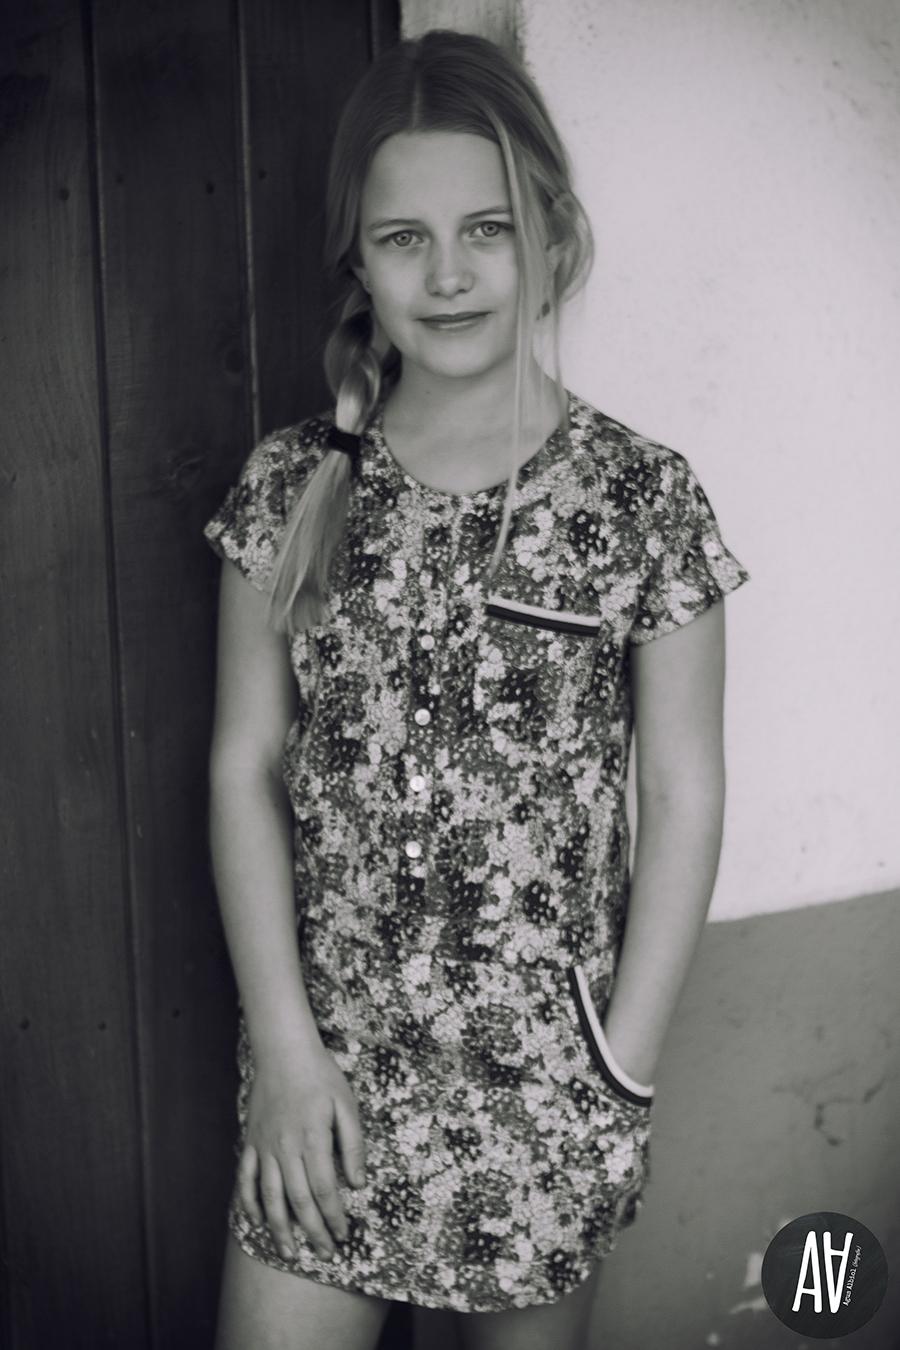 editorial petit style moda niños fotografa de moda vontage farmers salvador models fotografa barcelona.11